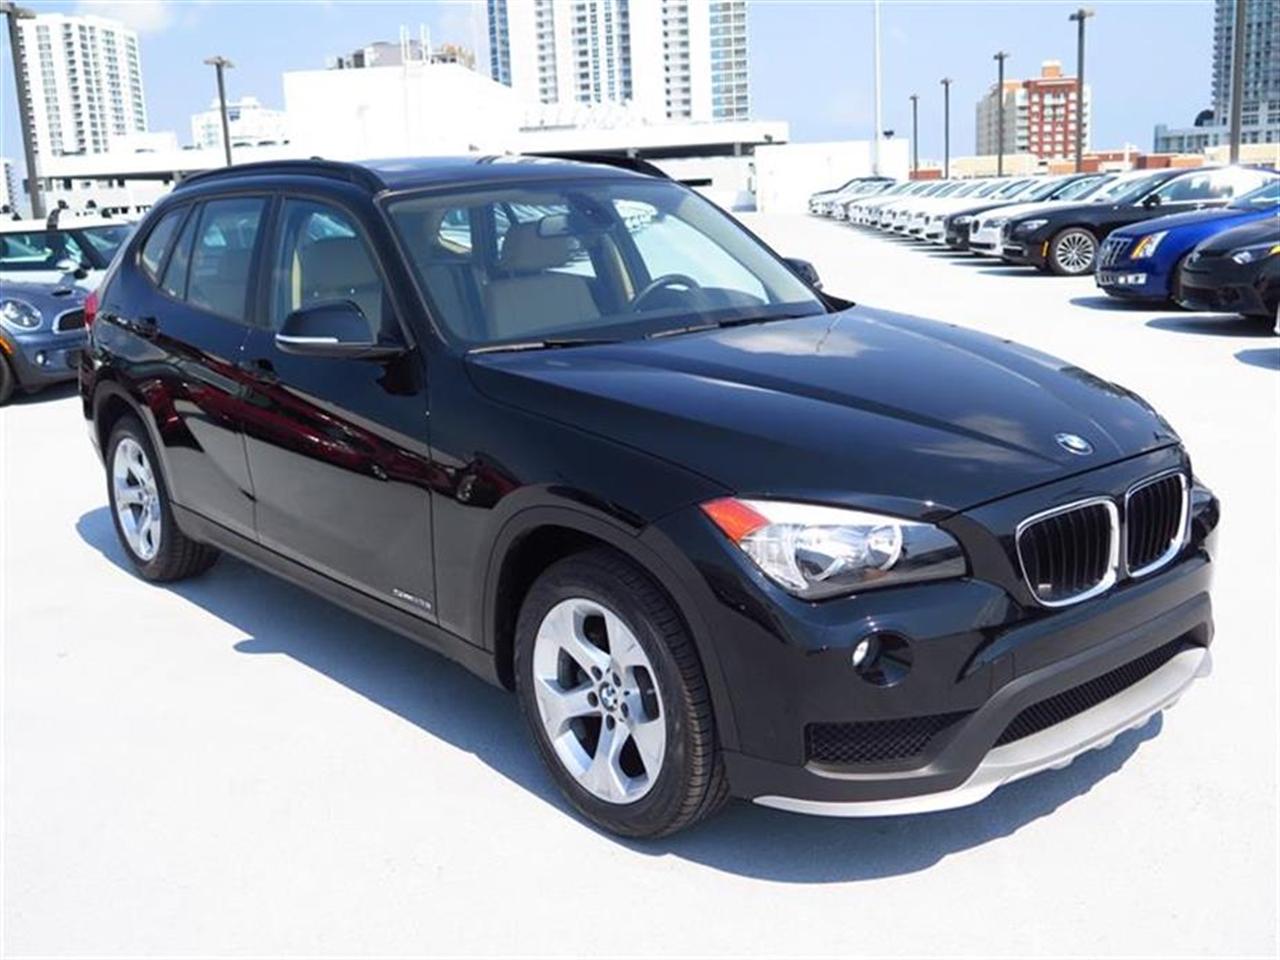 2015 BMW X1 RWD 4dr sDrive28i 14205 miles 2 Seatback Storage Pockets 3 12V DC Power Outlets 40-